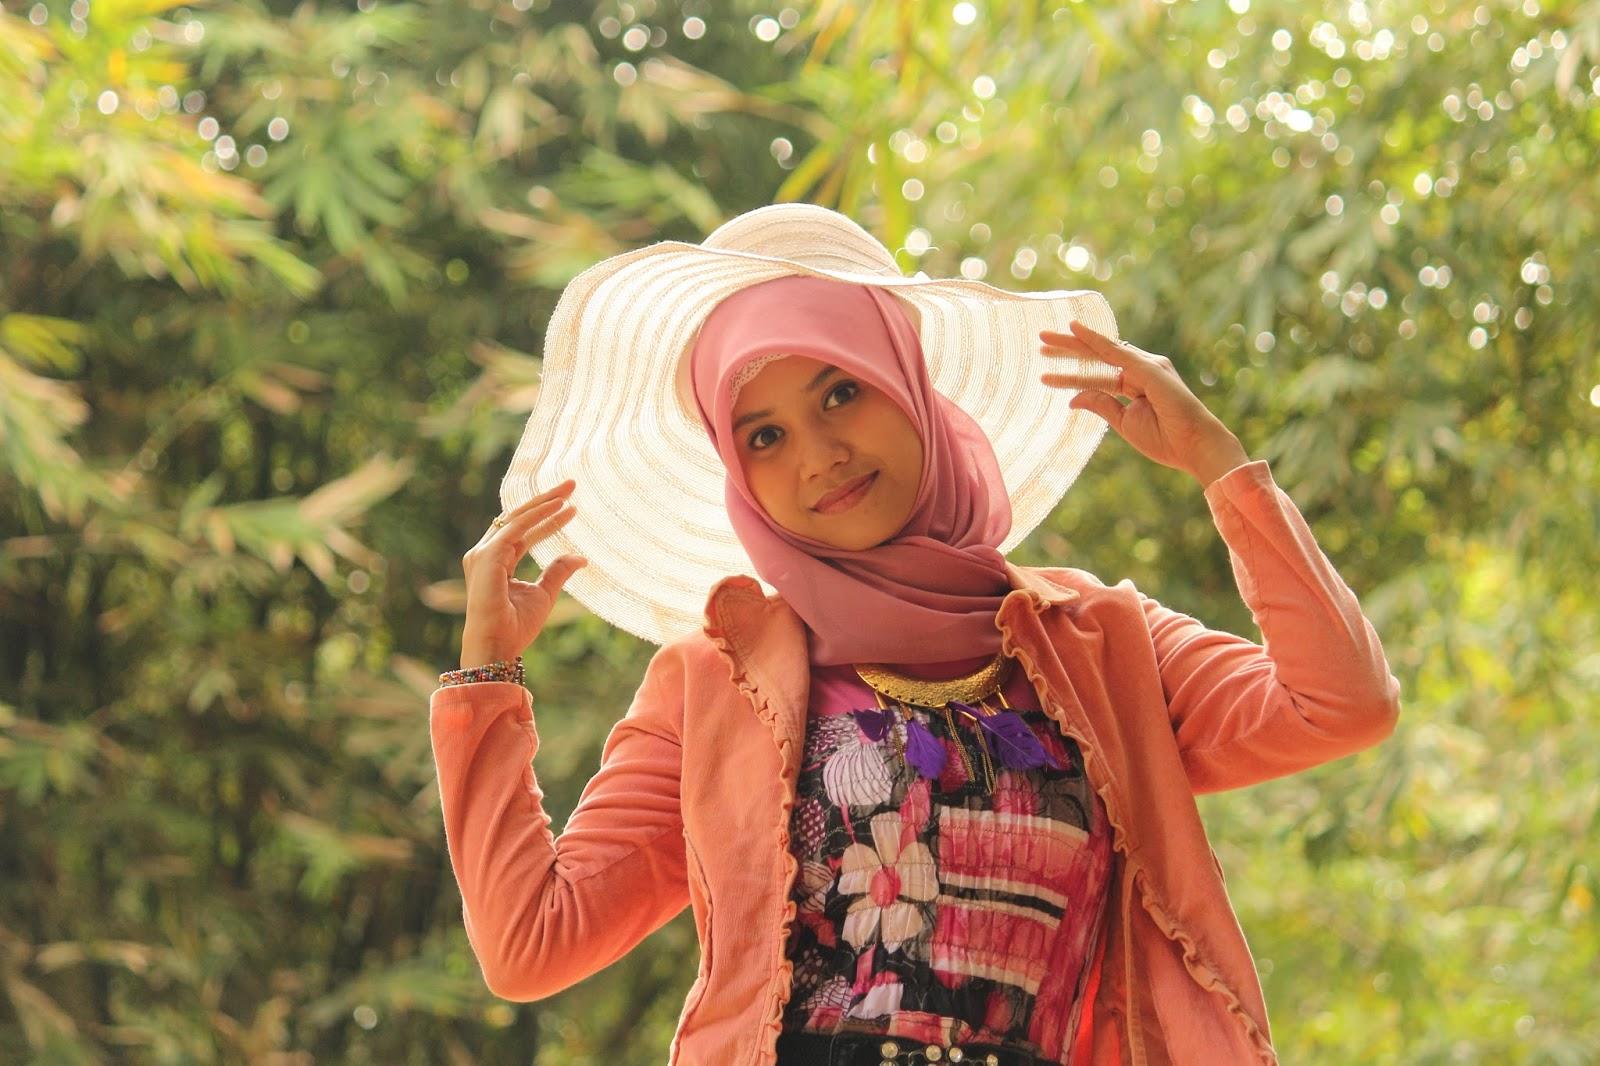 Hunting Model hijab cantik Hani Nirmalasari Jibaer Mahasiswa Kampus manis gaun pengantin Hunting Model hijab cantik Hani Nirmalasari Jibaer Mahasiswa Kampus manis graduation Hunting Model hijab cantik Hani Nirmalasari Jibaer Mahasiswa Kampus manis gemuk